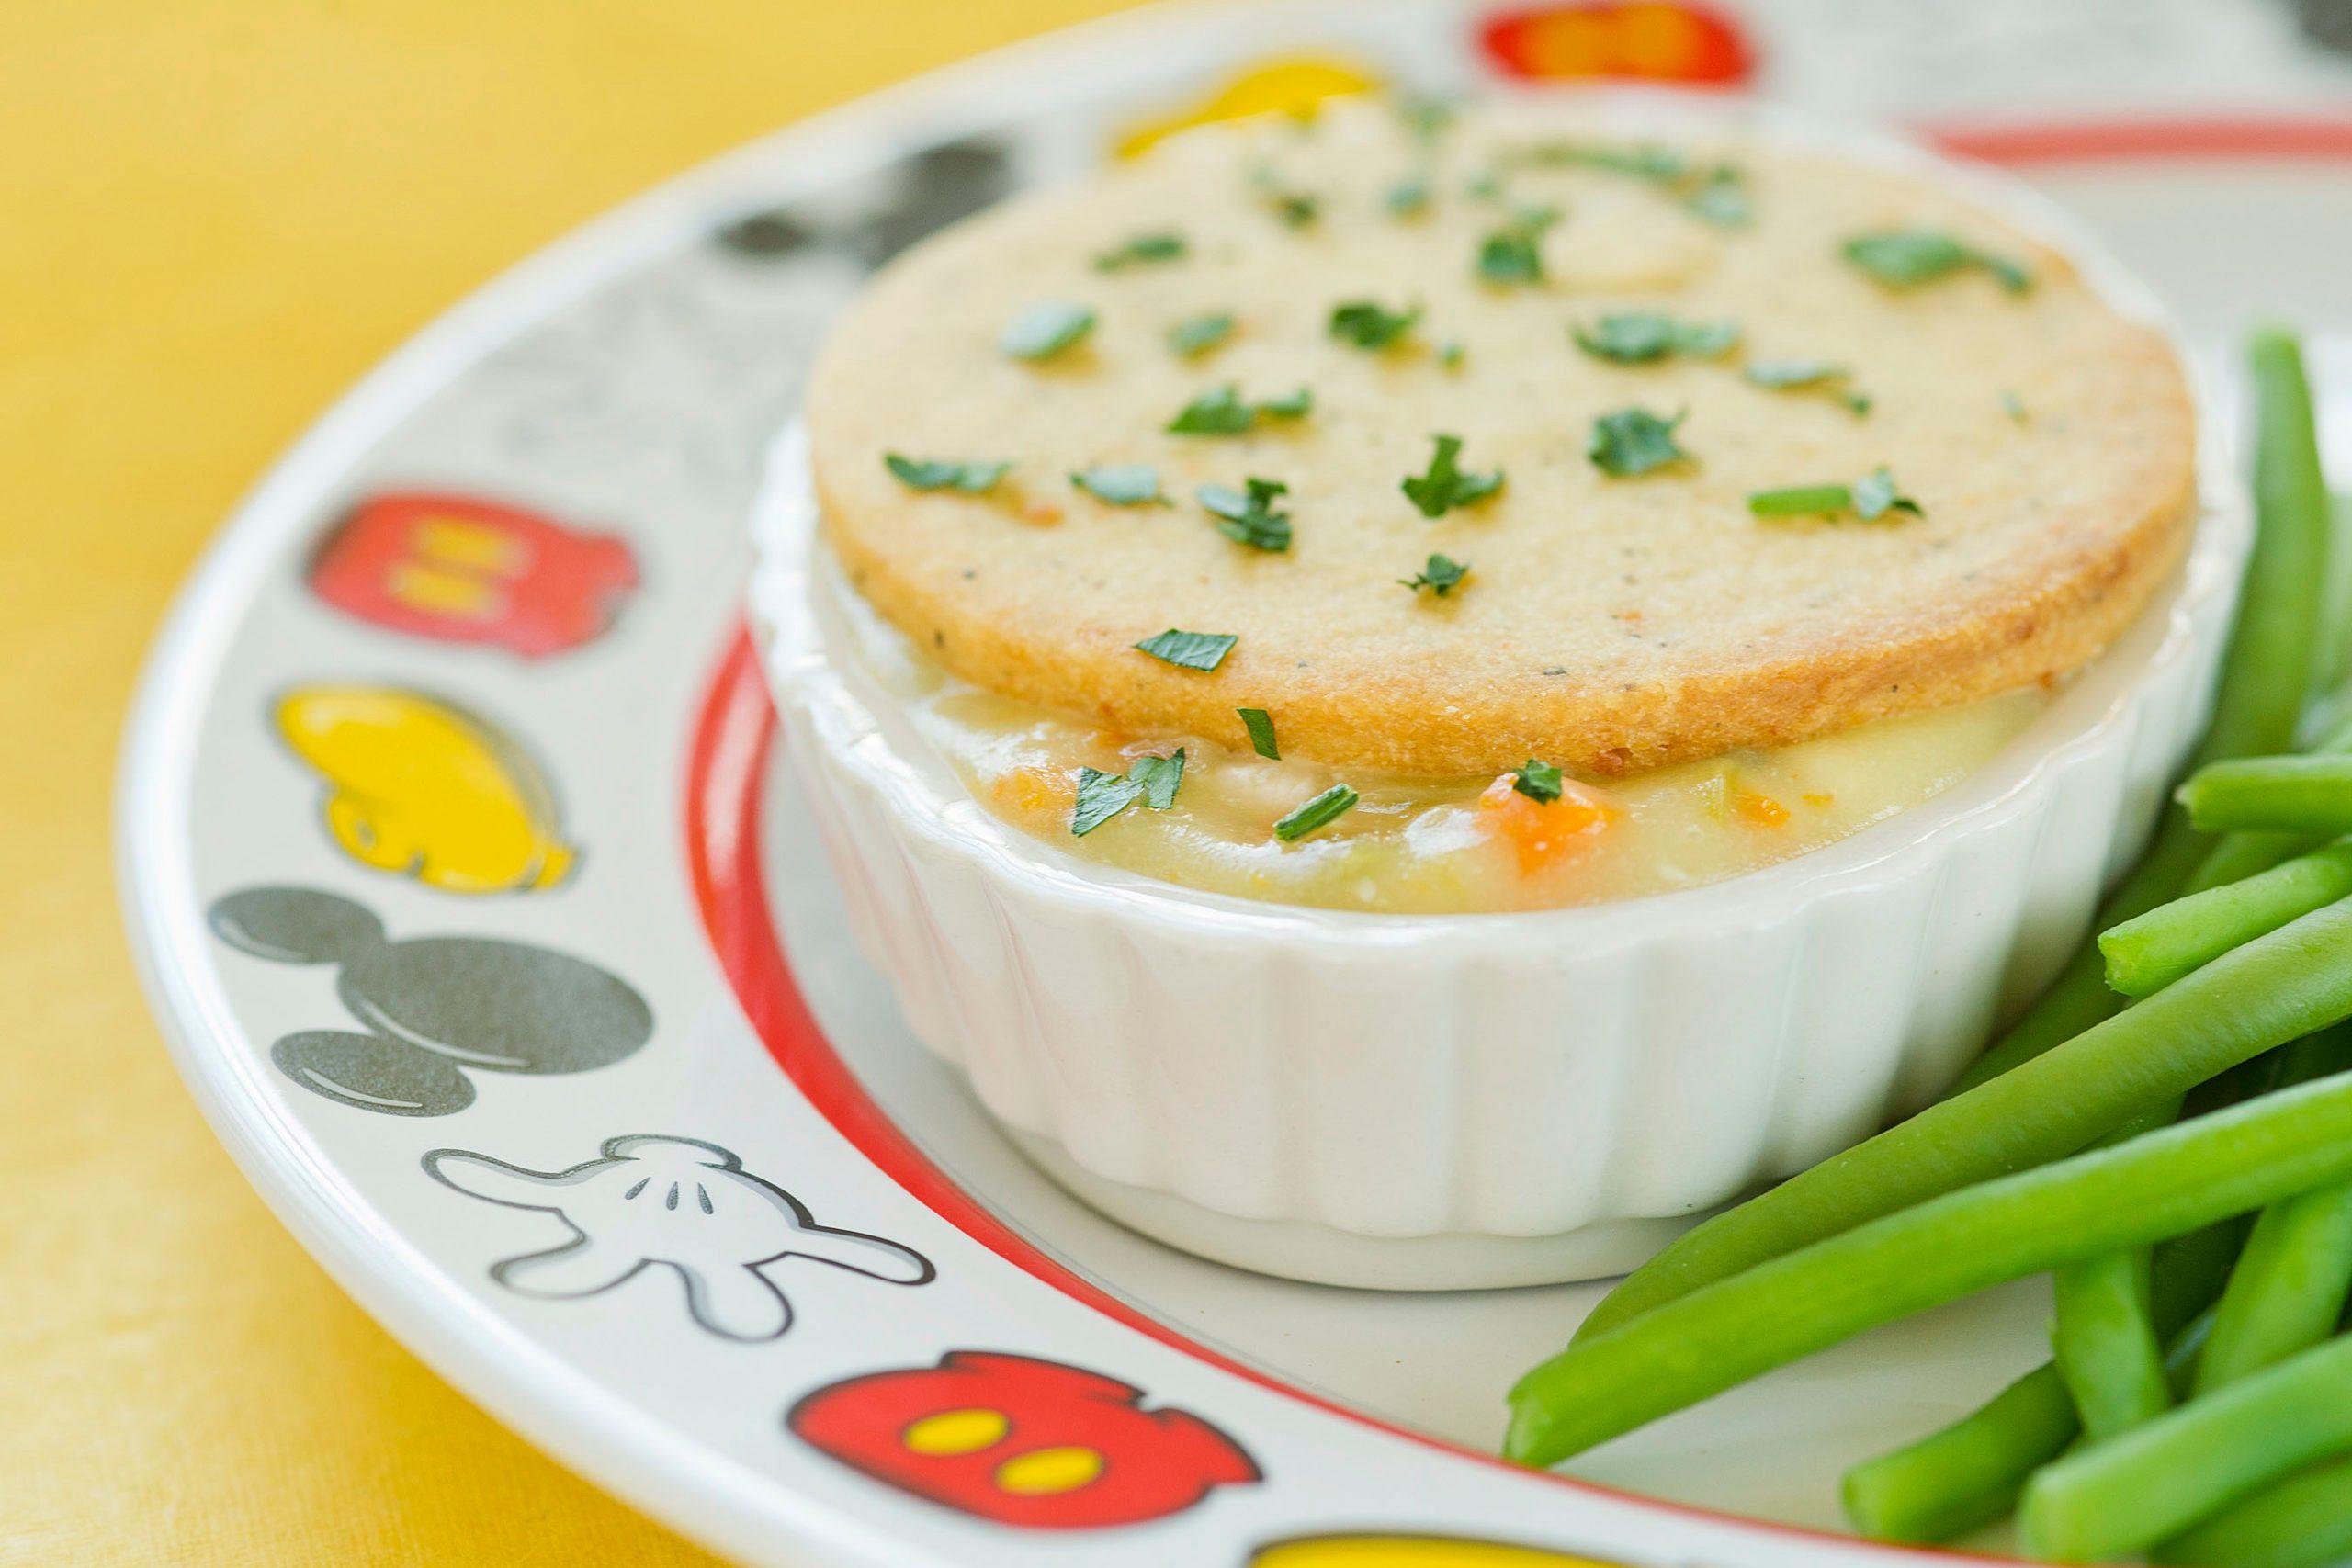 Cinderella's Royal Table Turkey Pot Pie